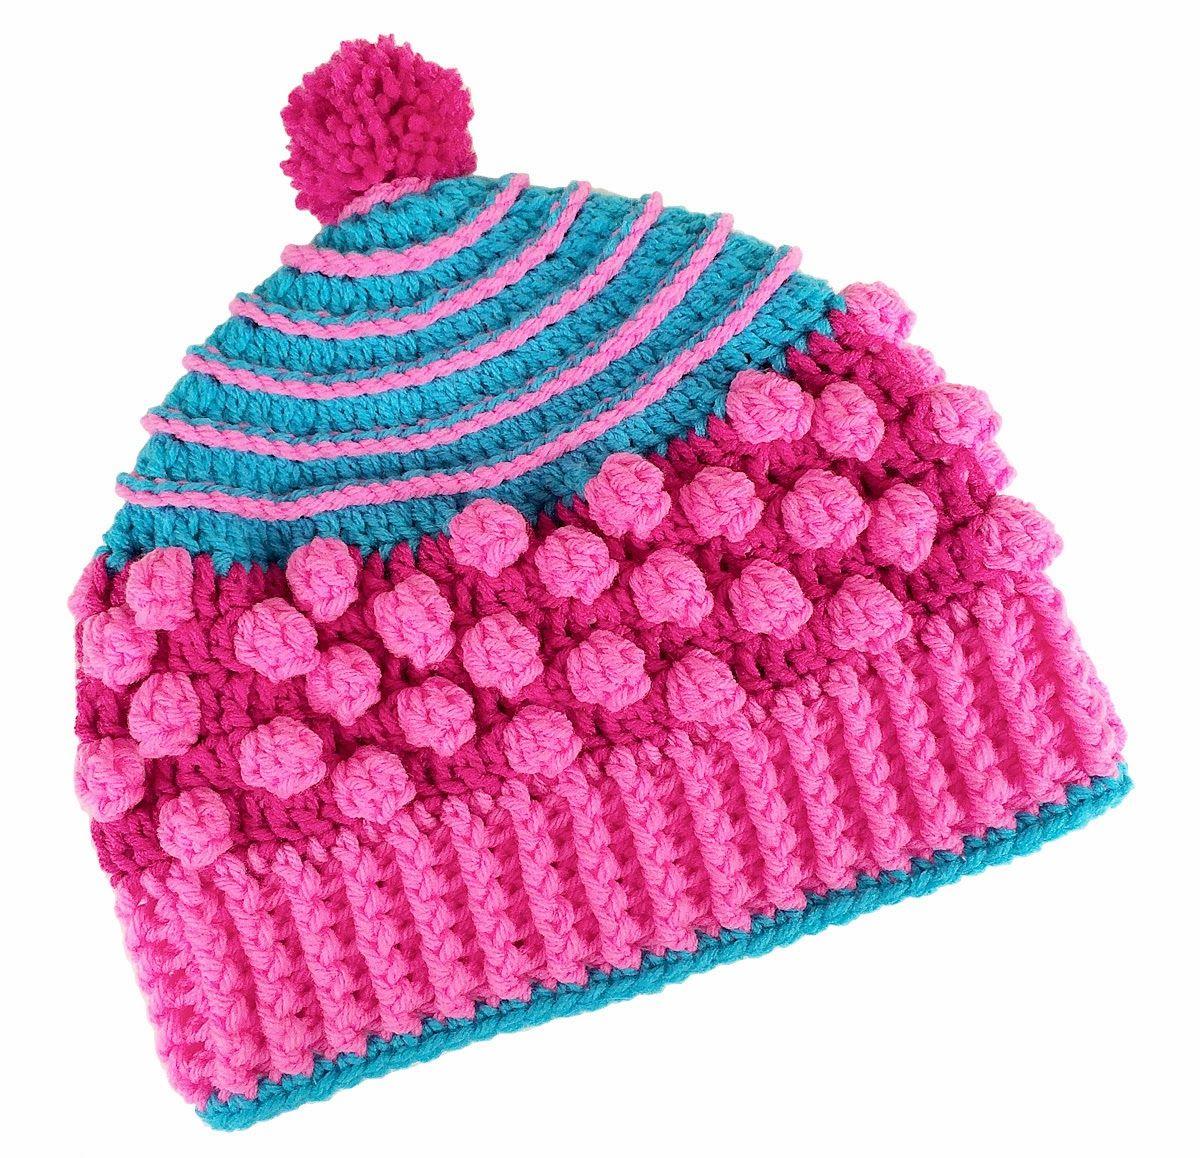 Carolyn Christmas Designs: Popcorn Pizzazz Hat Pattern